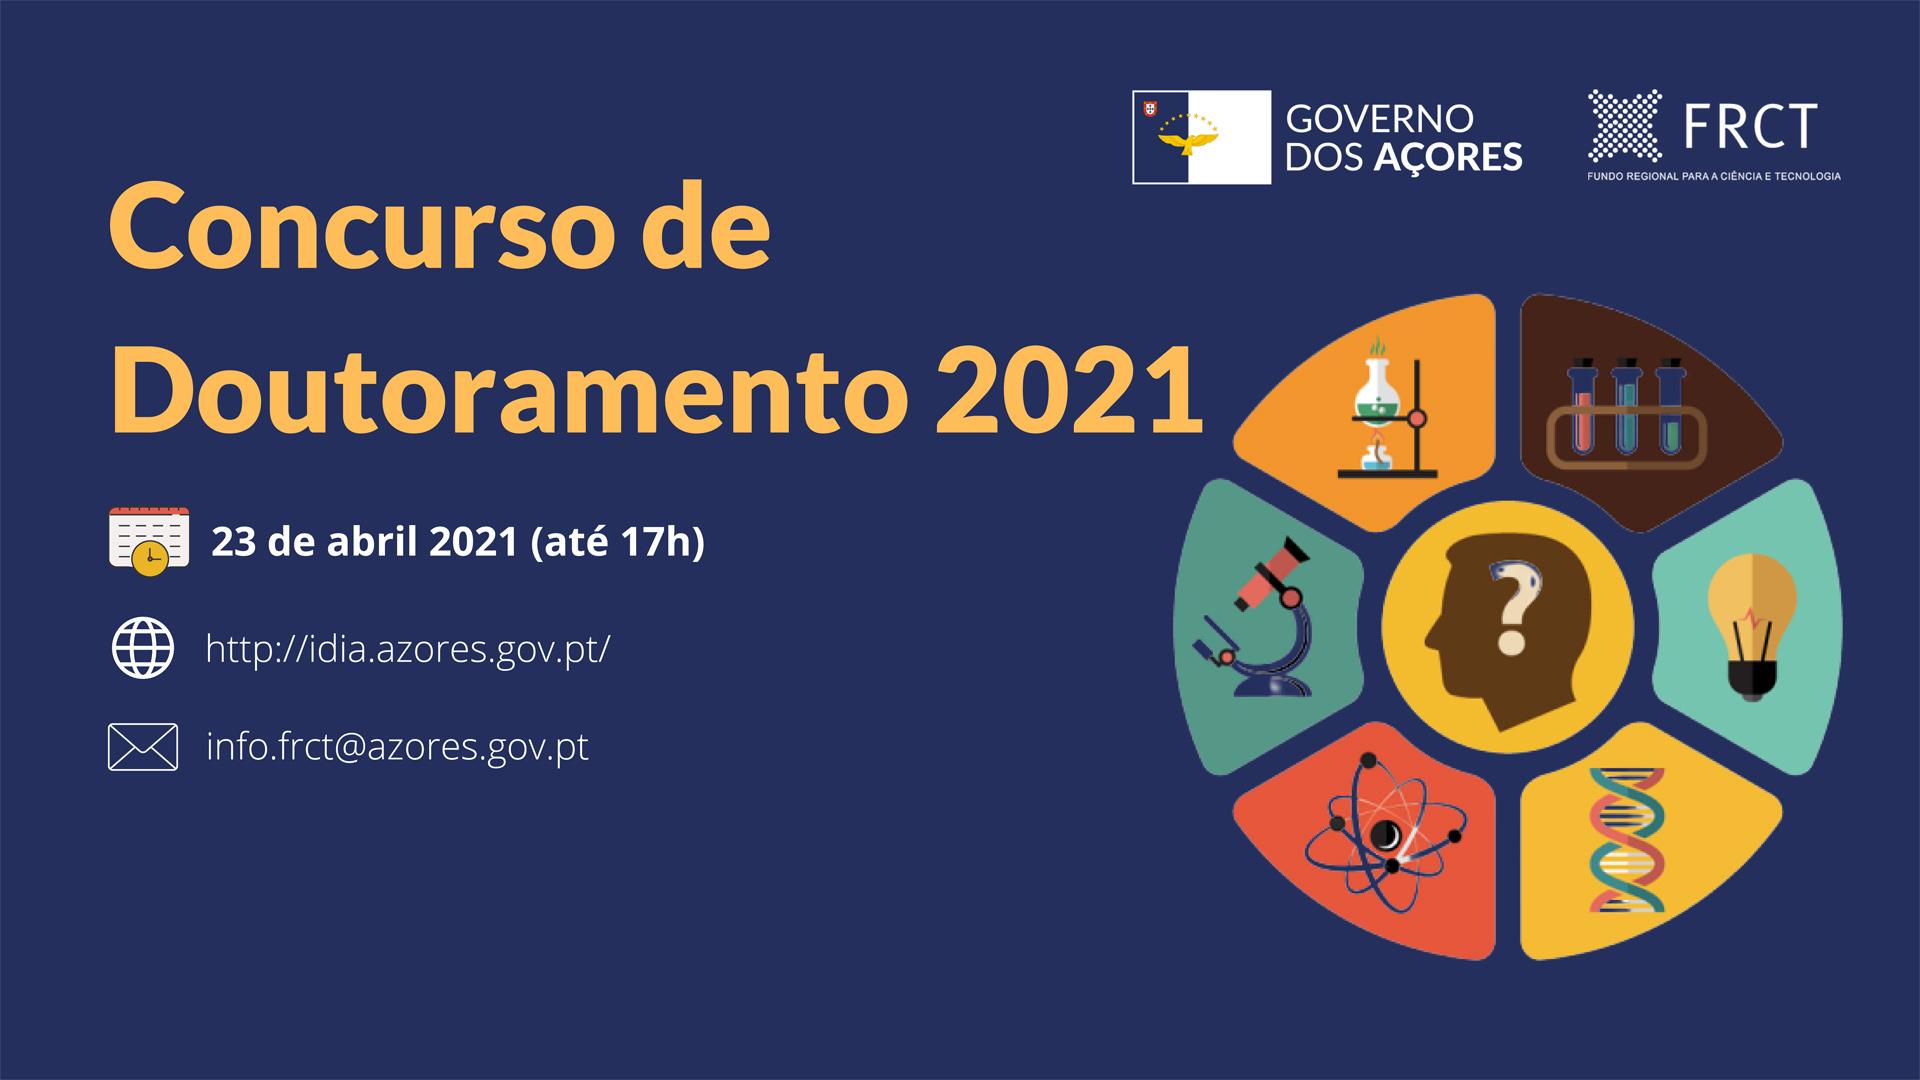 ABERTO CONCURSO PARA BOLSAS DE DOUTORAMENTO 2021